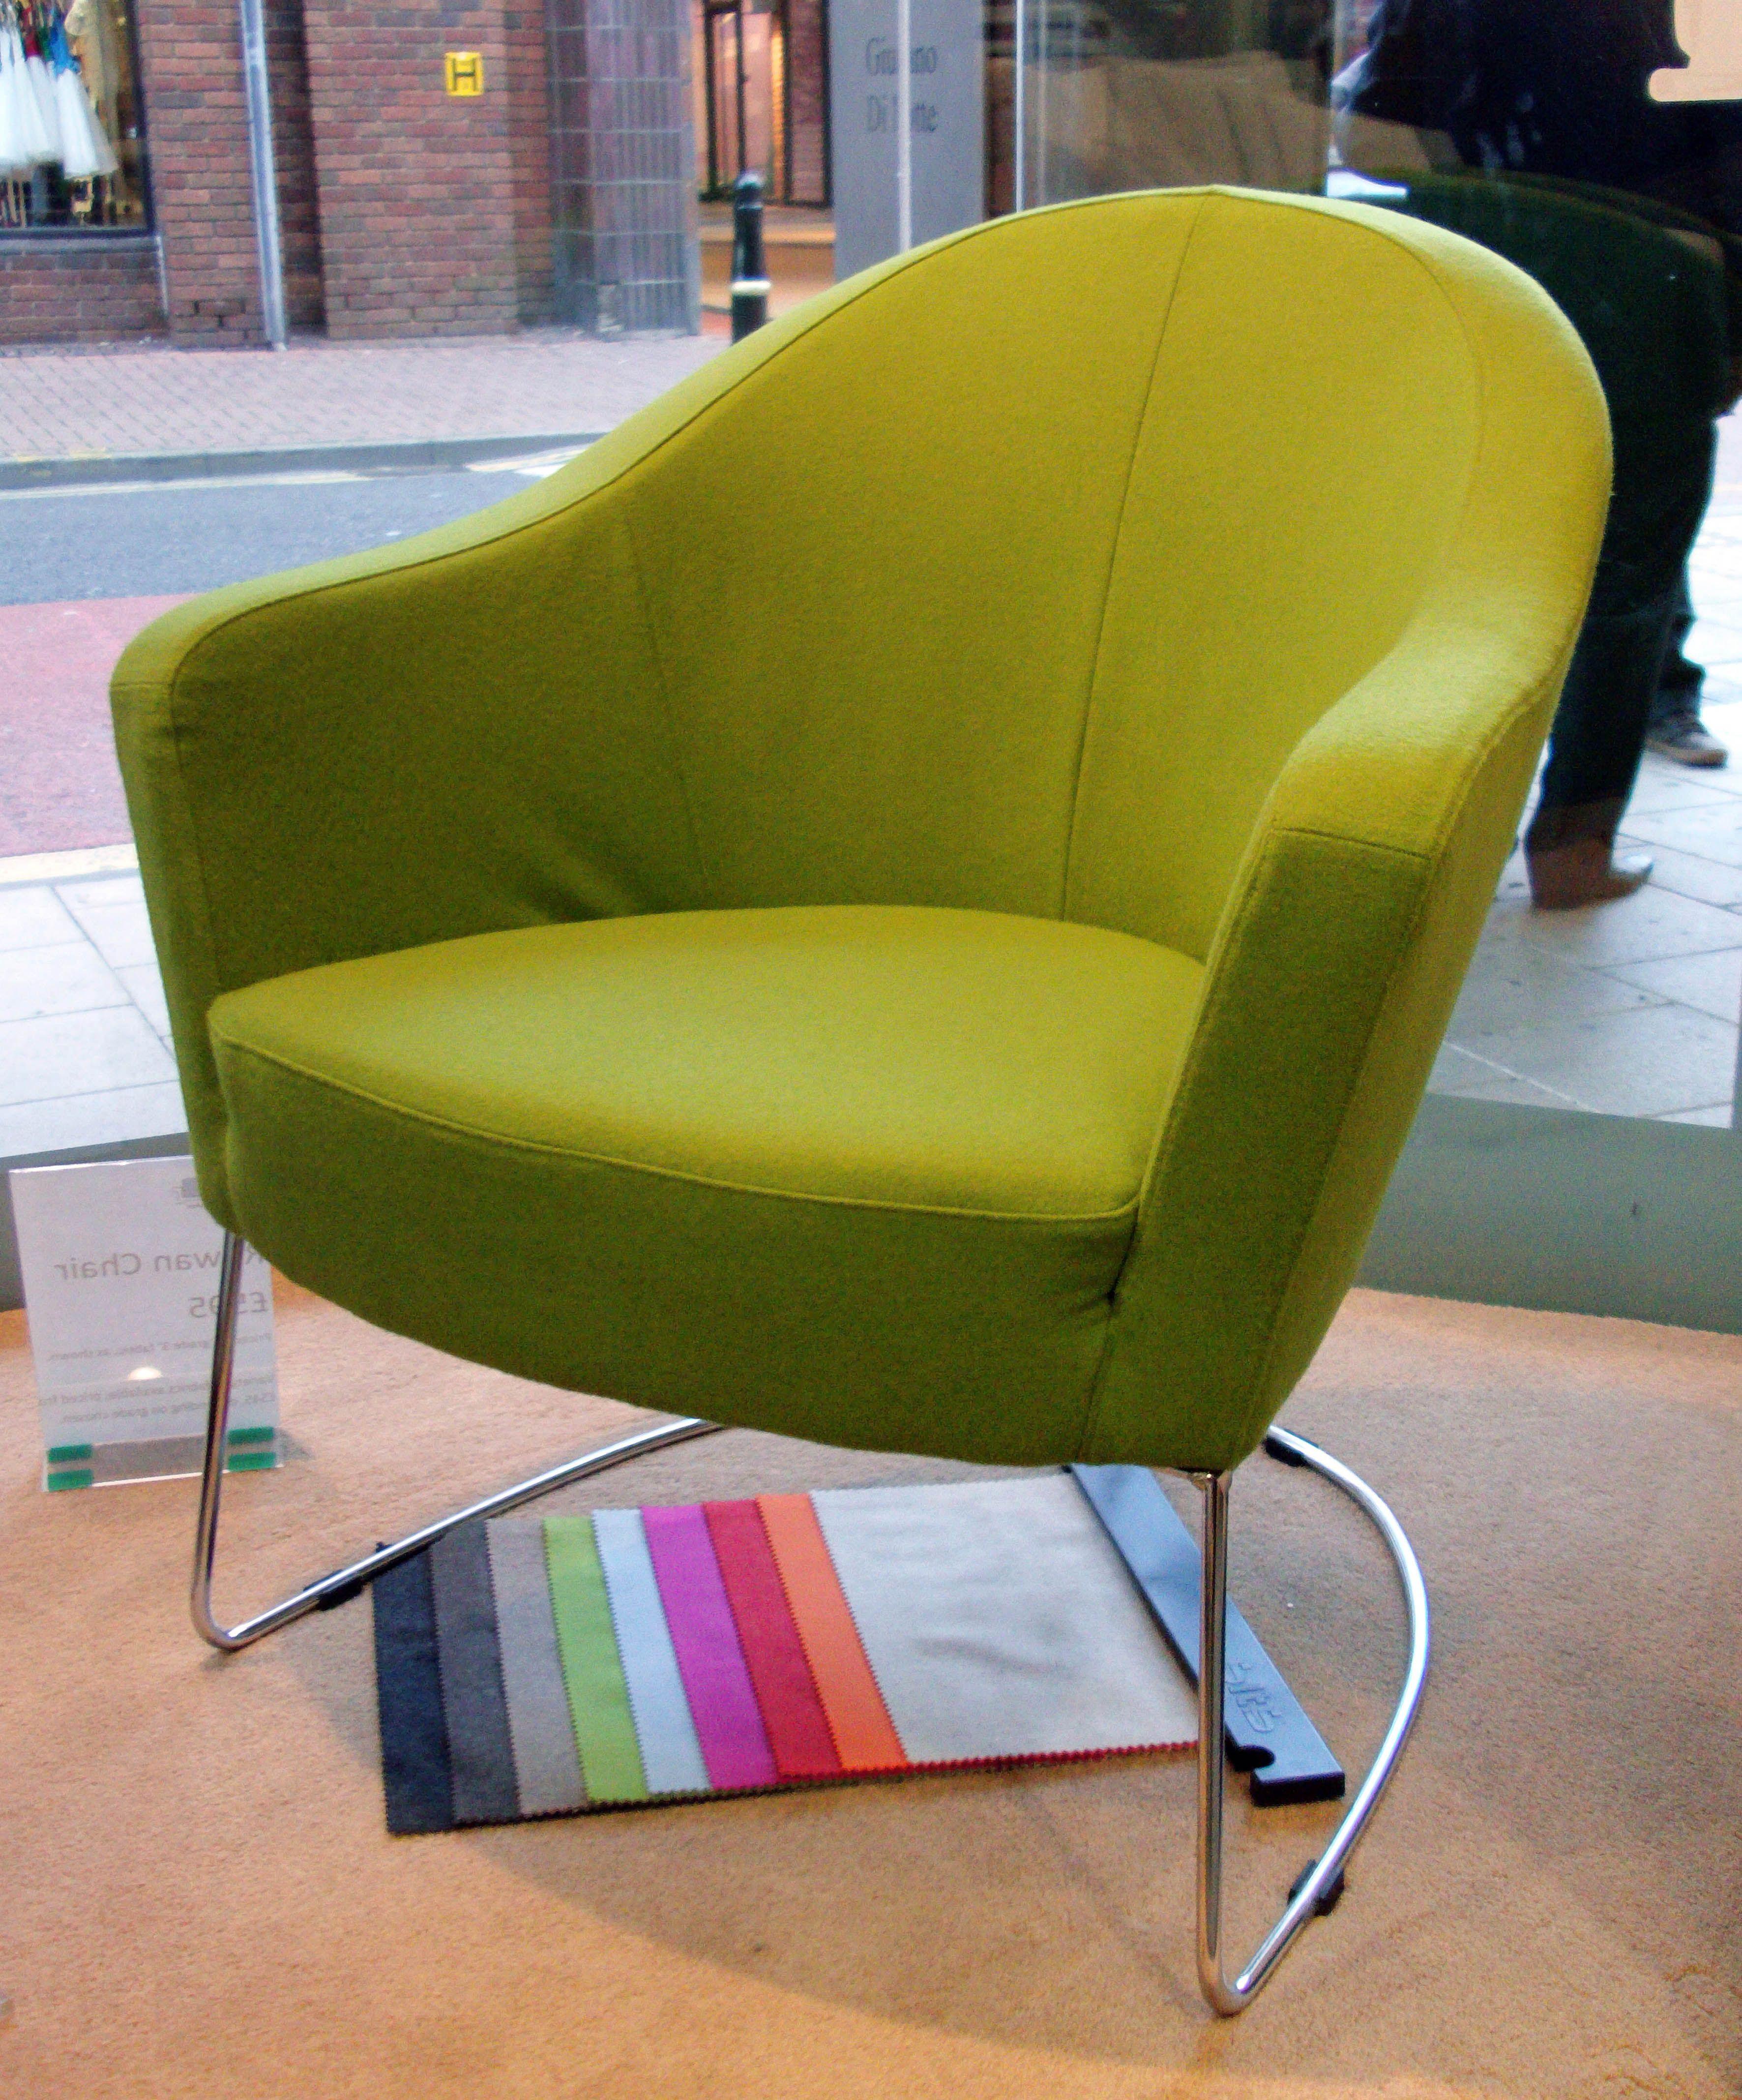 Bright green felt on this designer standalone chair